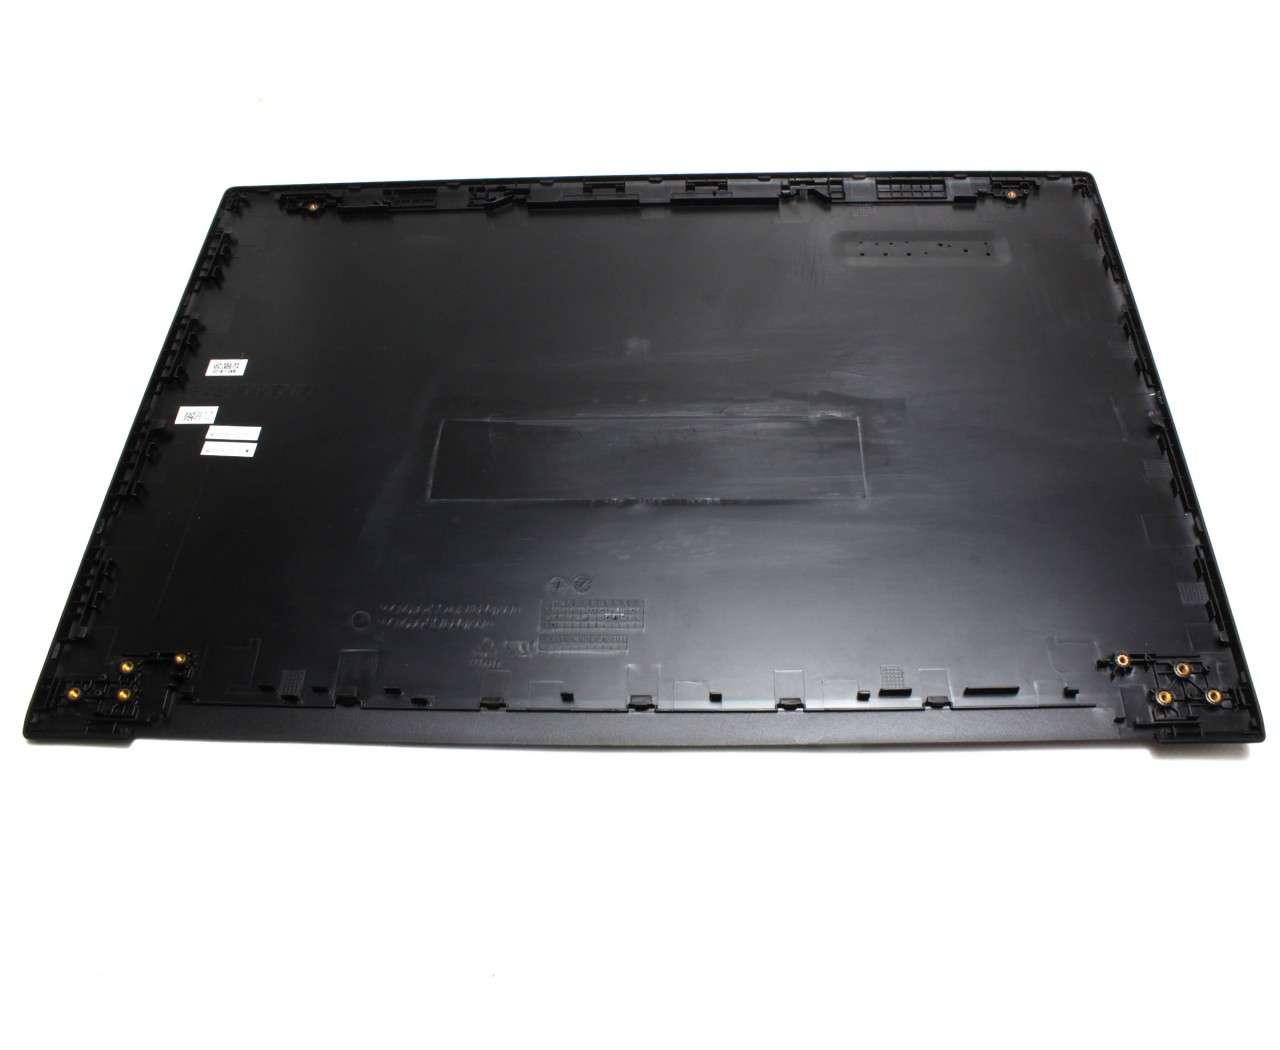 Capac Display BackCover Lenovo 4ELV9LCLV00 Carcasa Display imagine powerlaptop.ro 2021